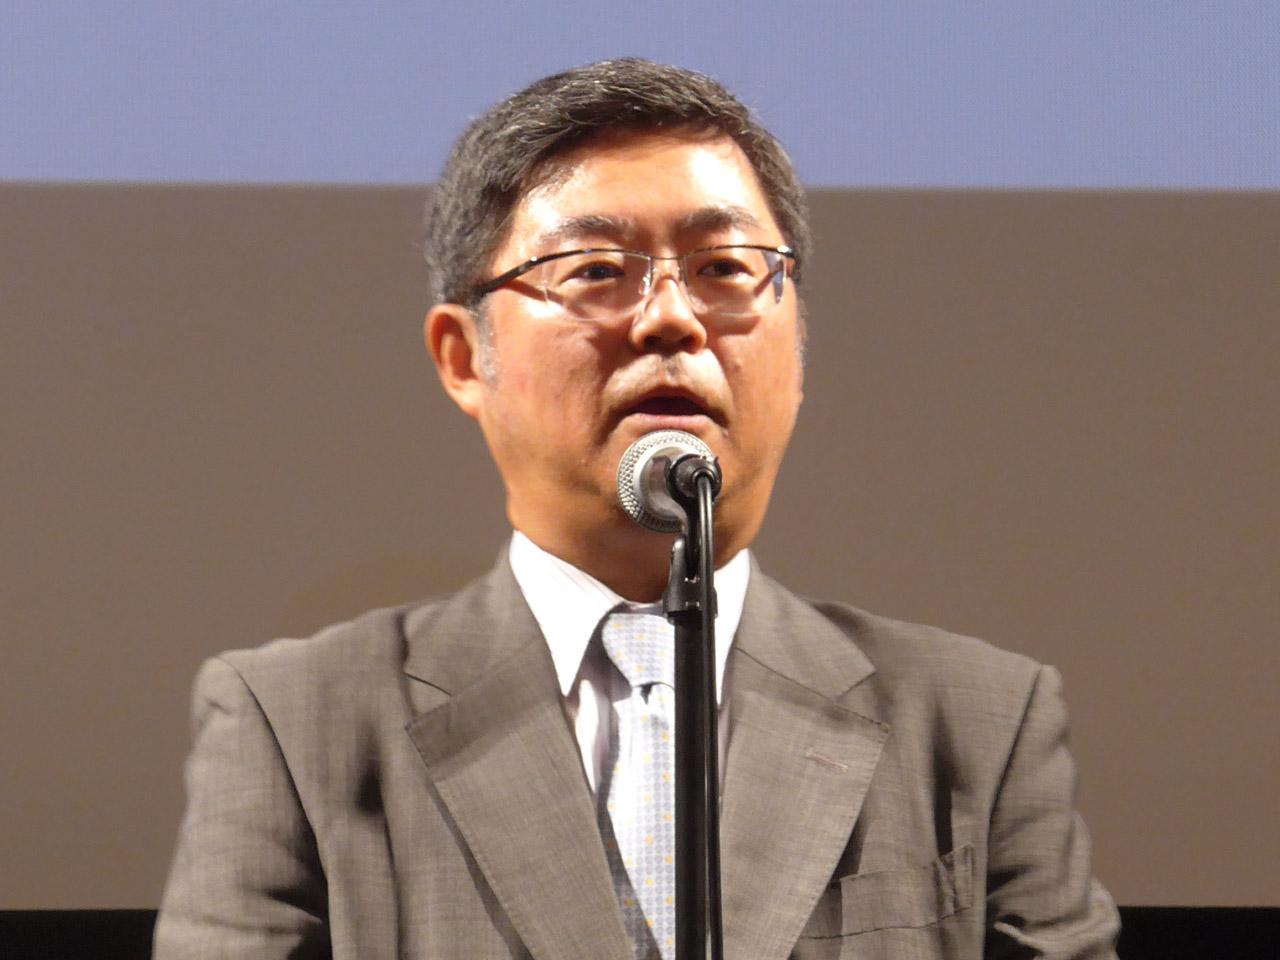 株式会社モリサワ代表取締役社長の森澤彰彦氏